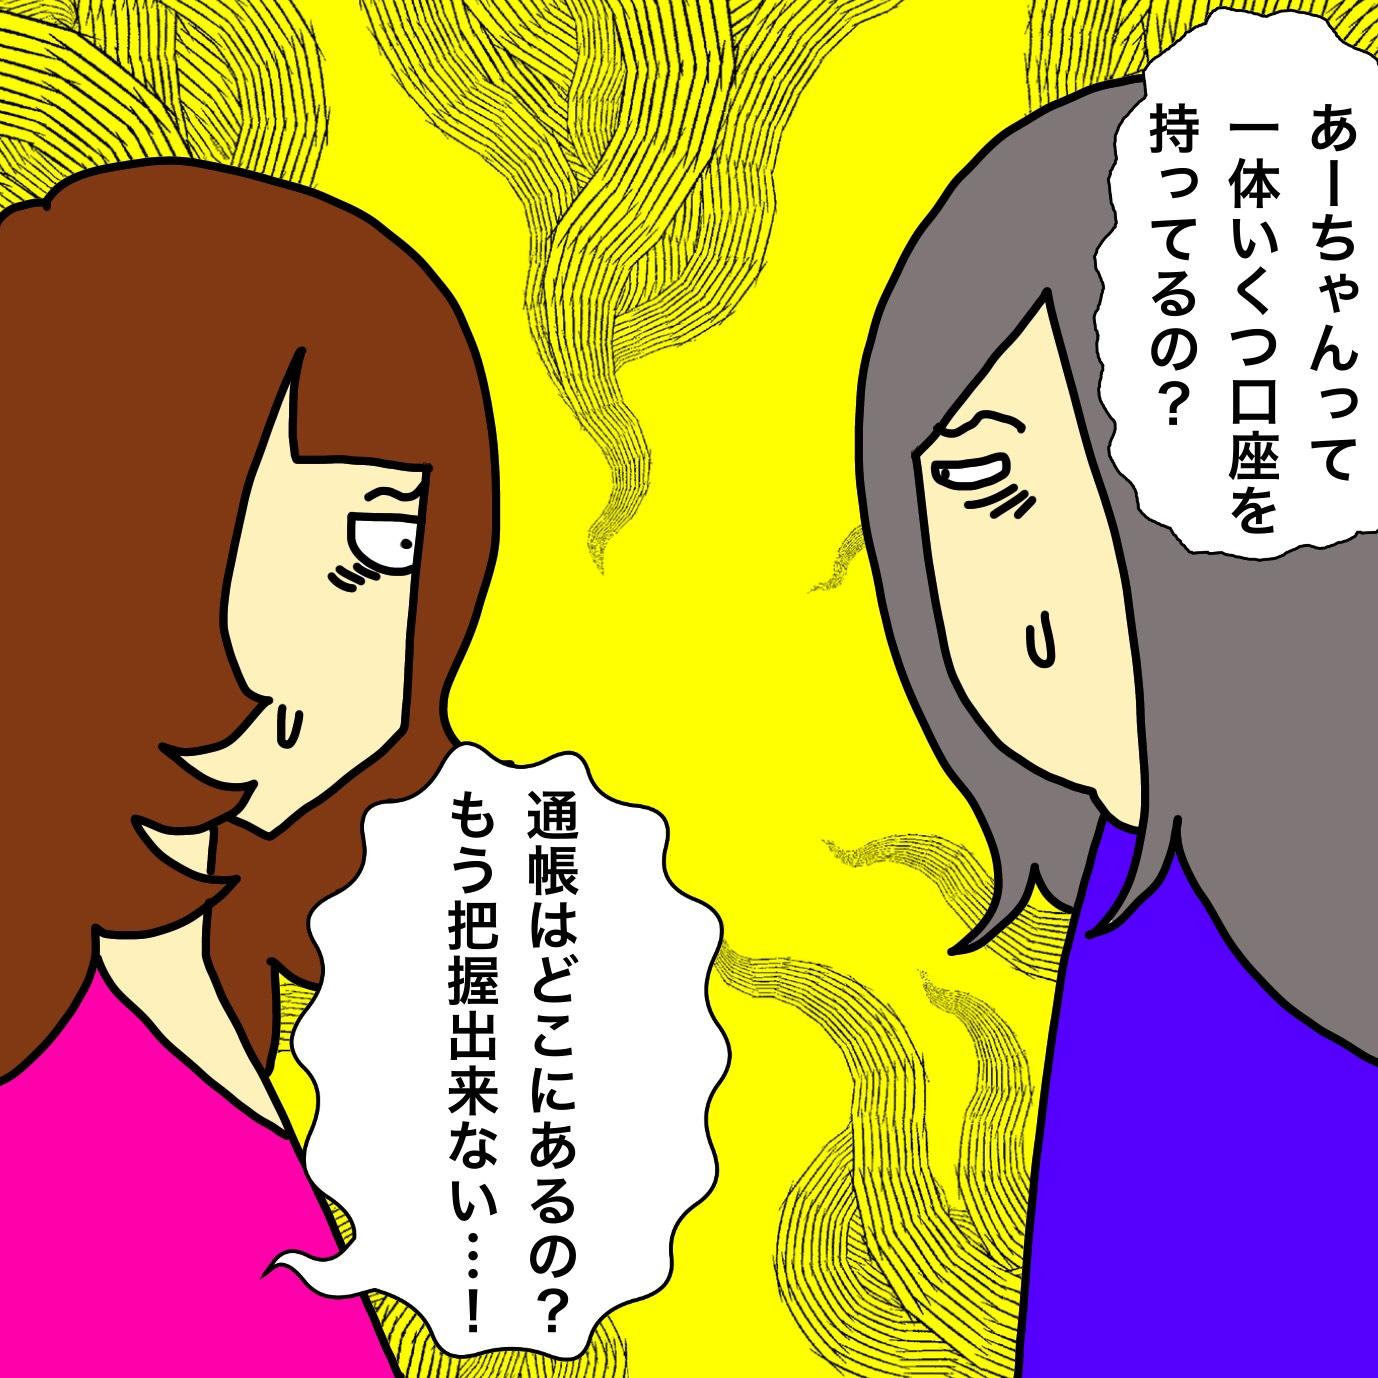 Image-26.jpeg